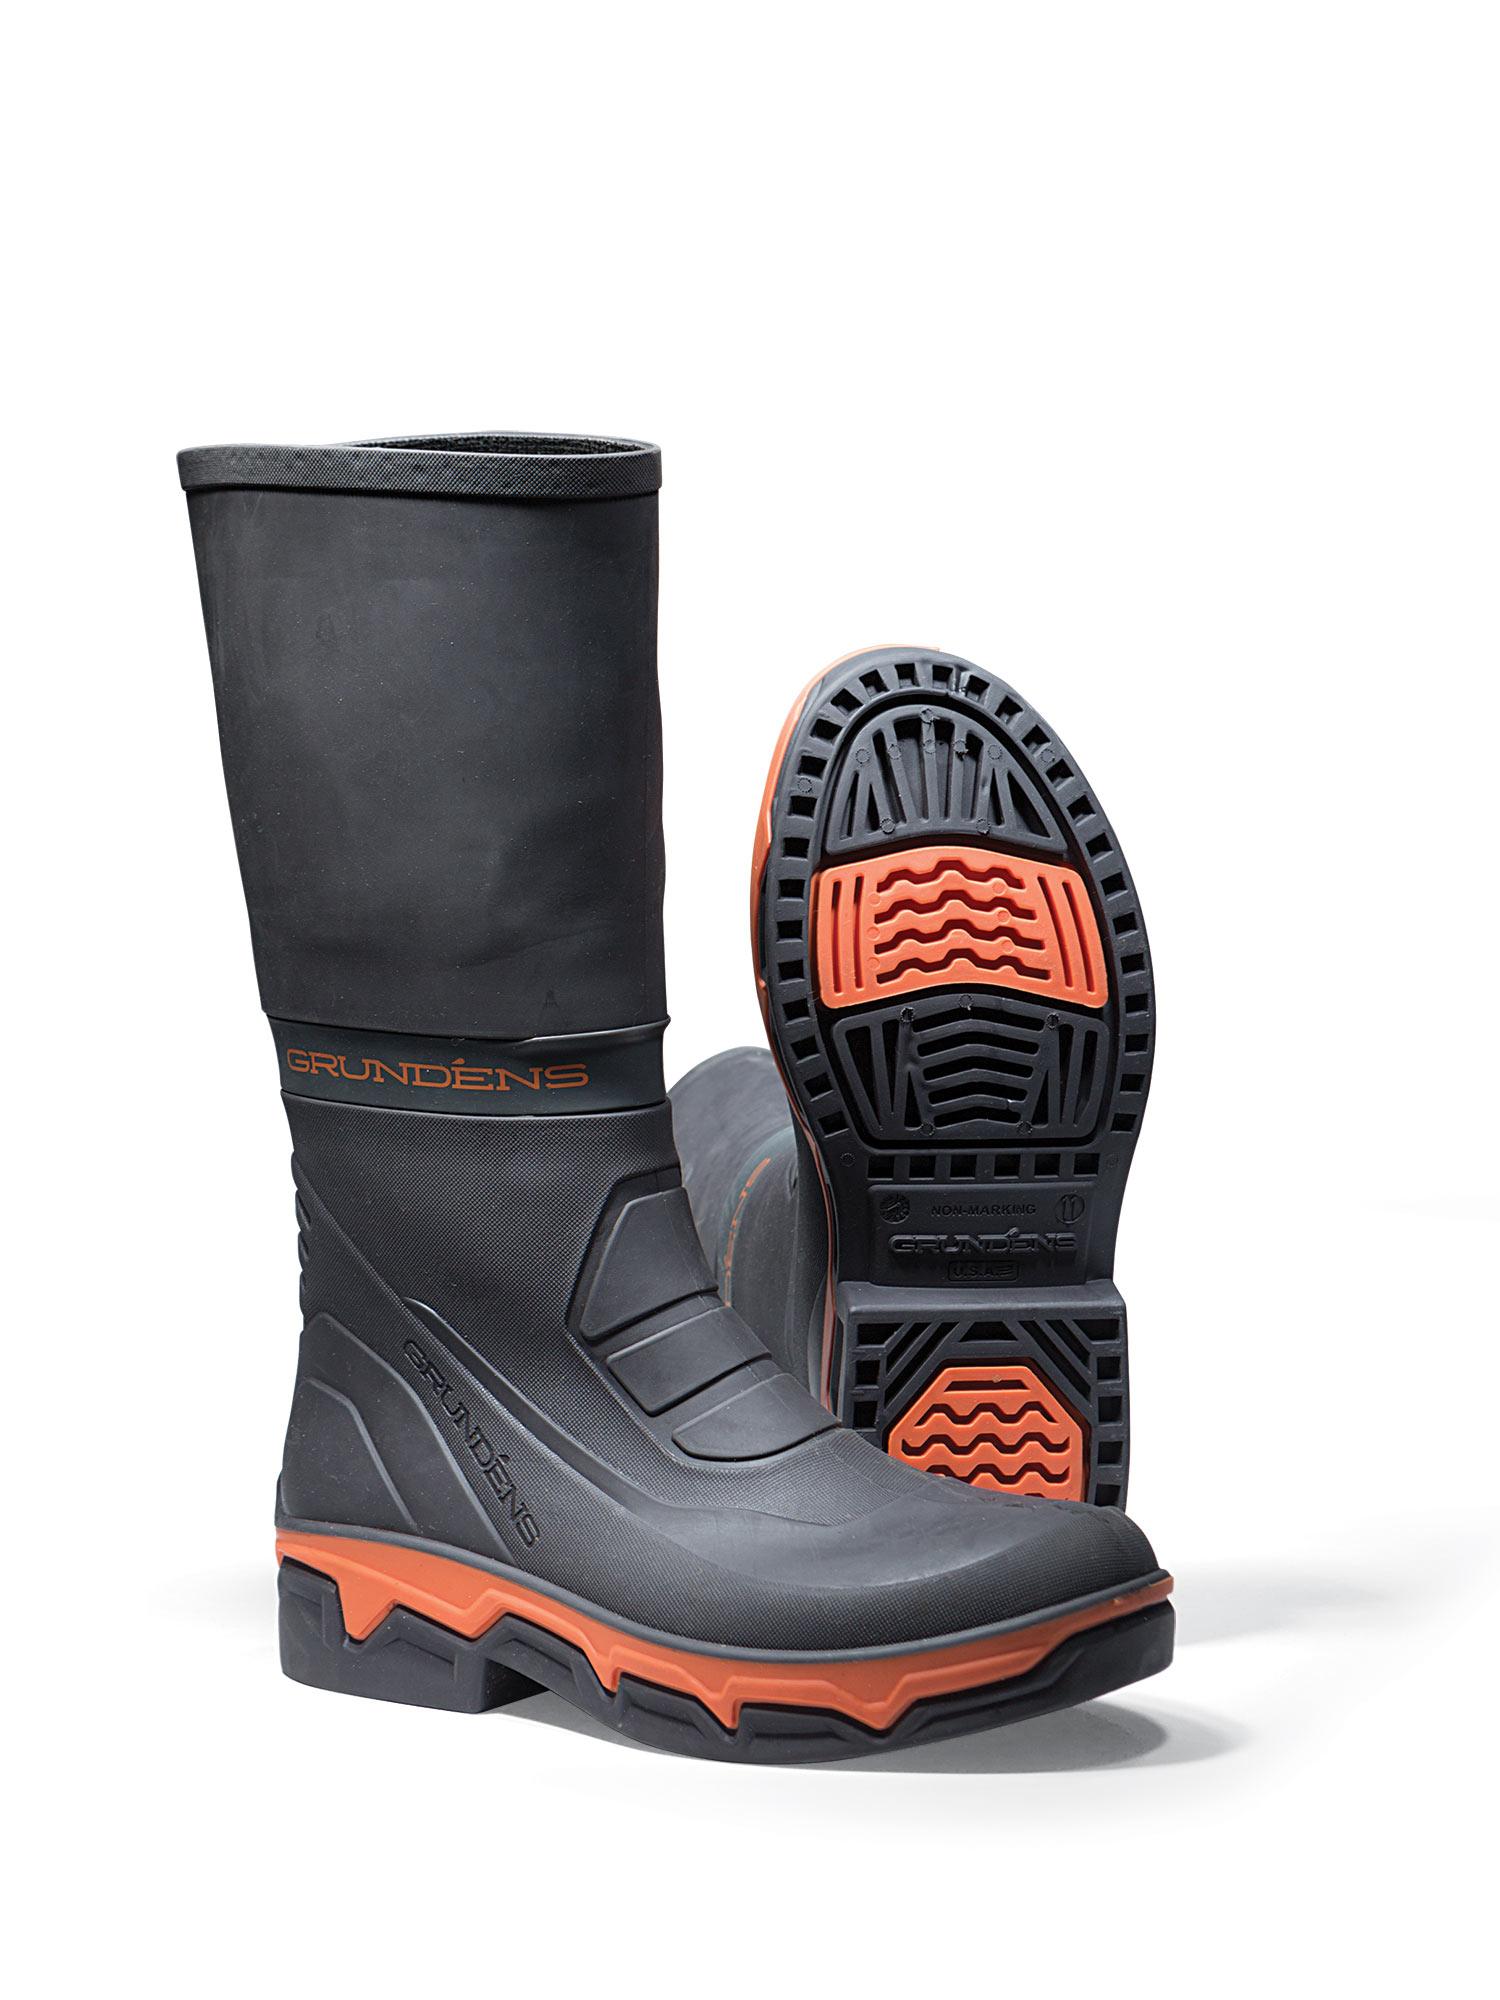 abda2656560 Fishing Boots for Bad Weather | Marlin Magazine